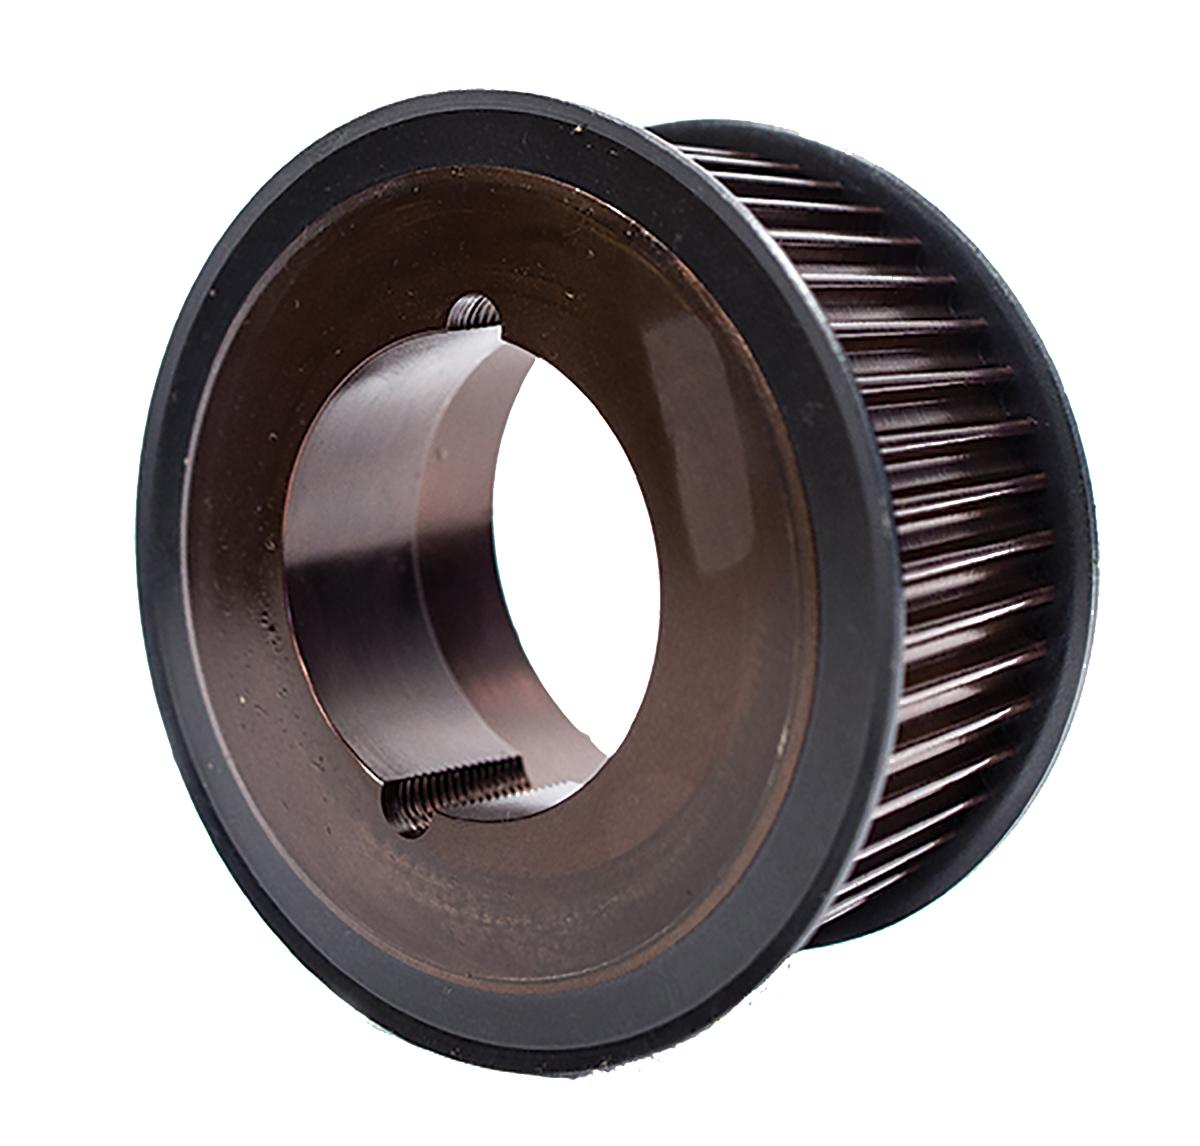 48-8P50-2012 - Cast Iron Powerhouse® Pulleys